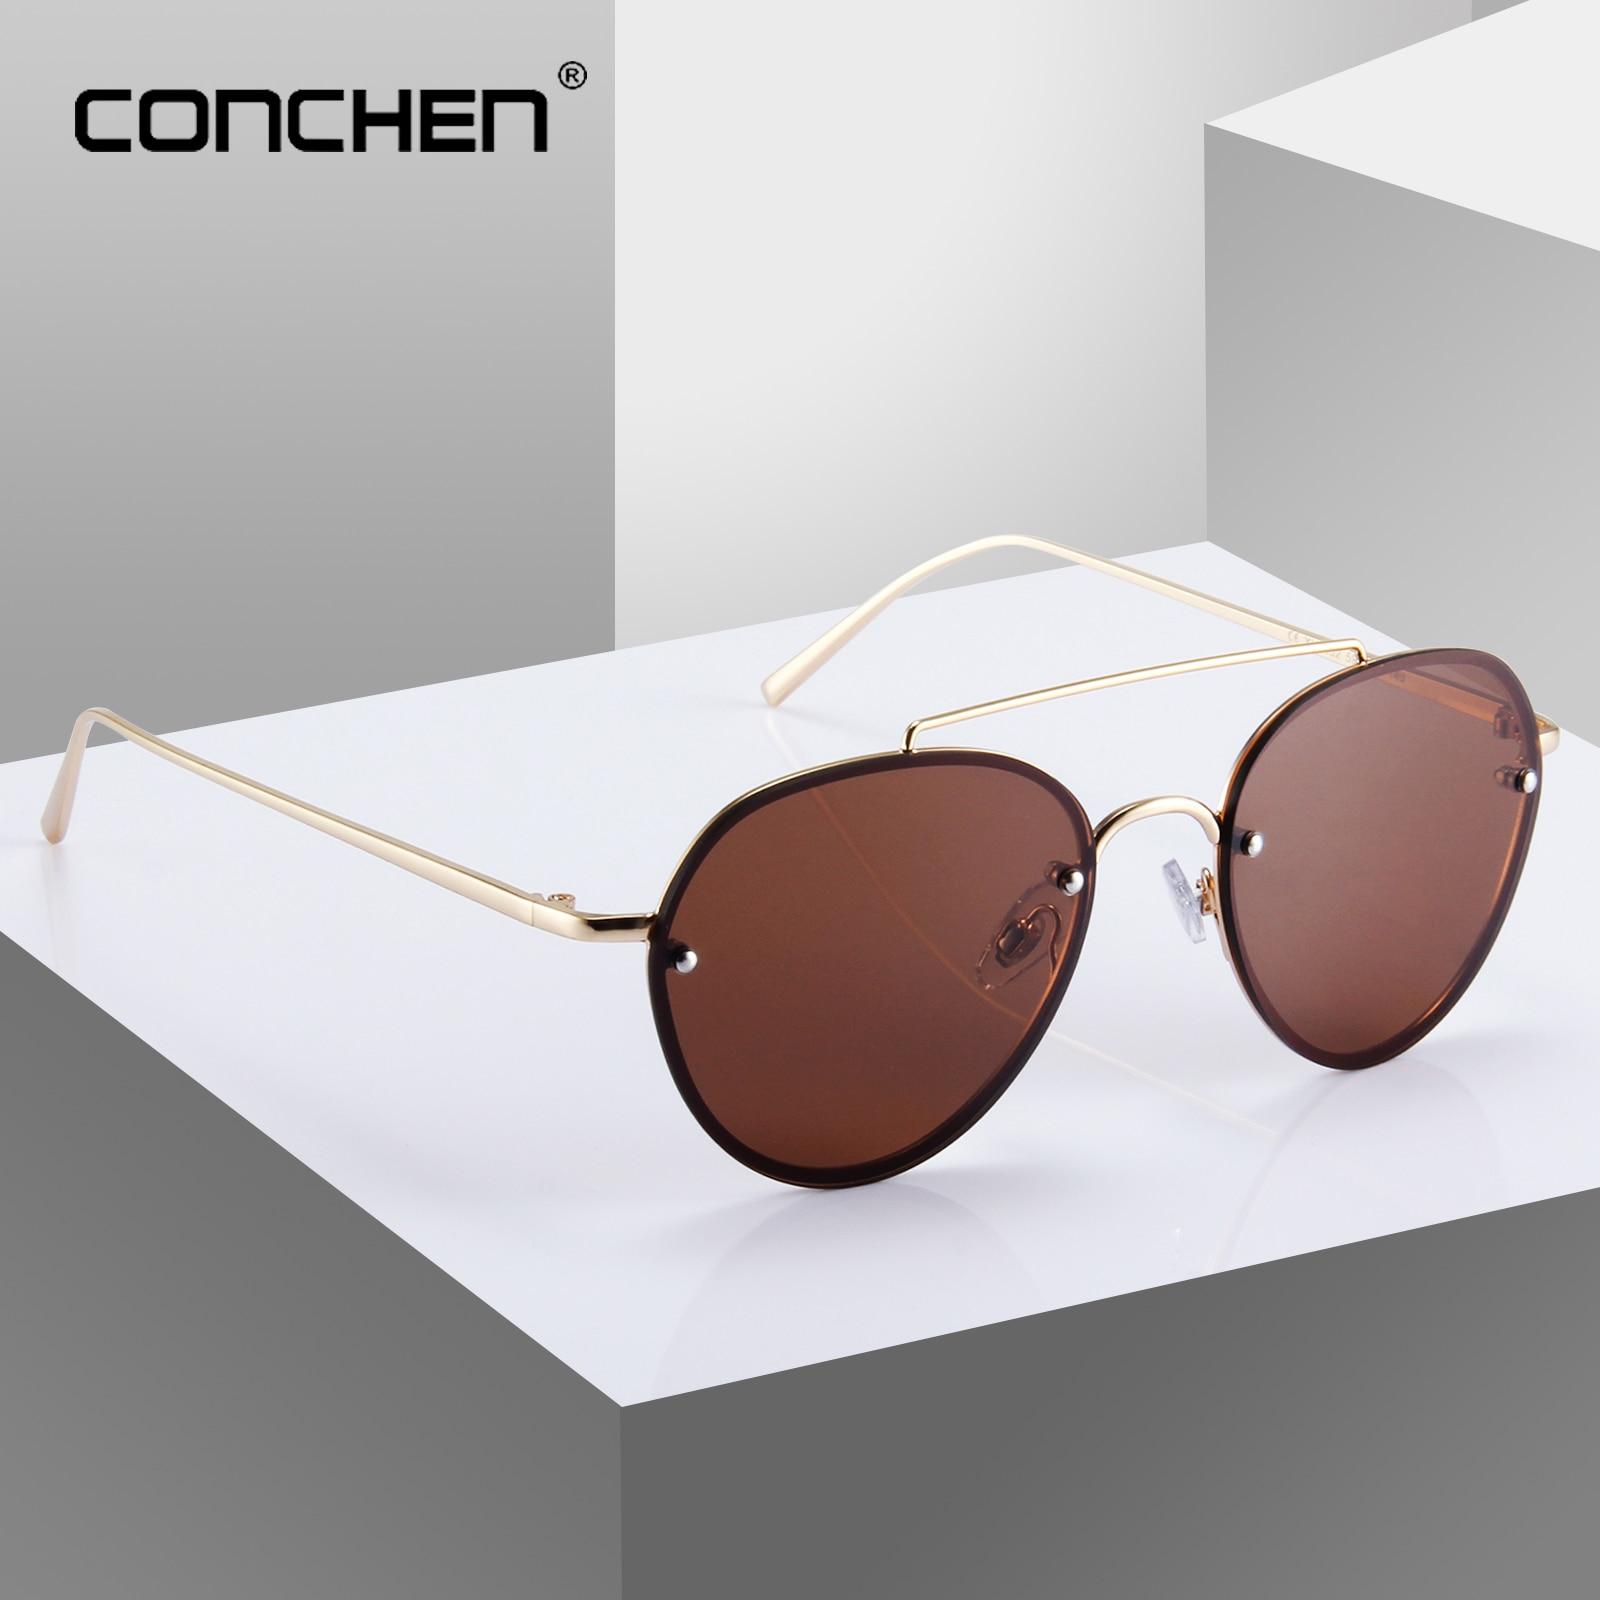 CONCHEN Pilot Men Driving Sun Glasses UV400 Alloy Frame Retro Mens Sunglasses 2019 New Arrival